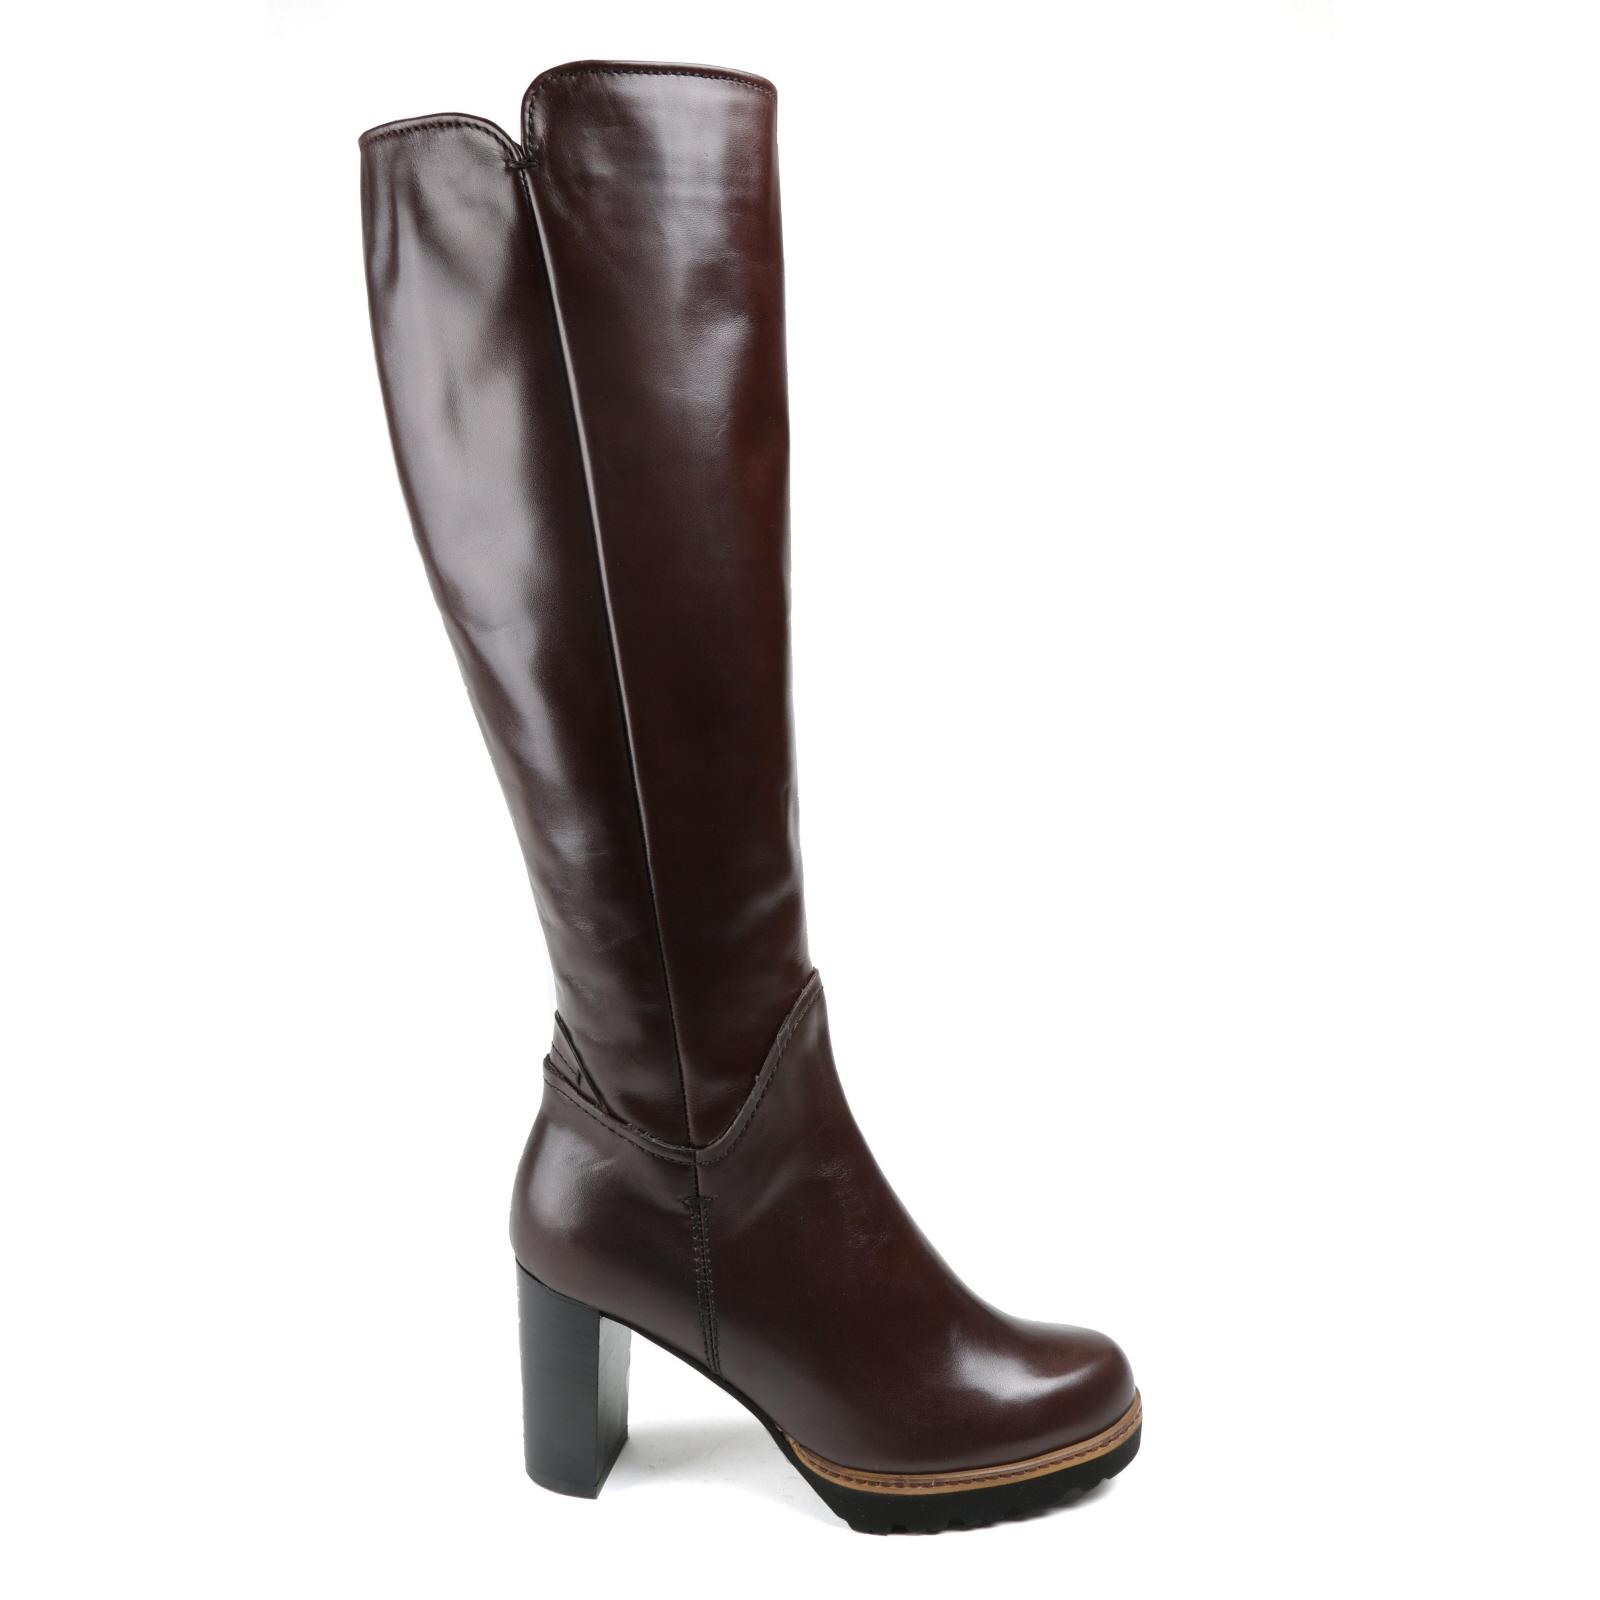 Damen Stiefel Maripe' Plateau braun  Glattleder NEU Gr.37,5